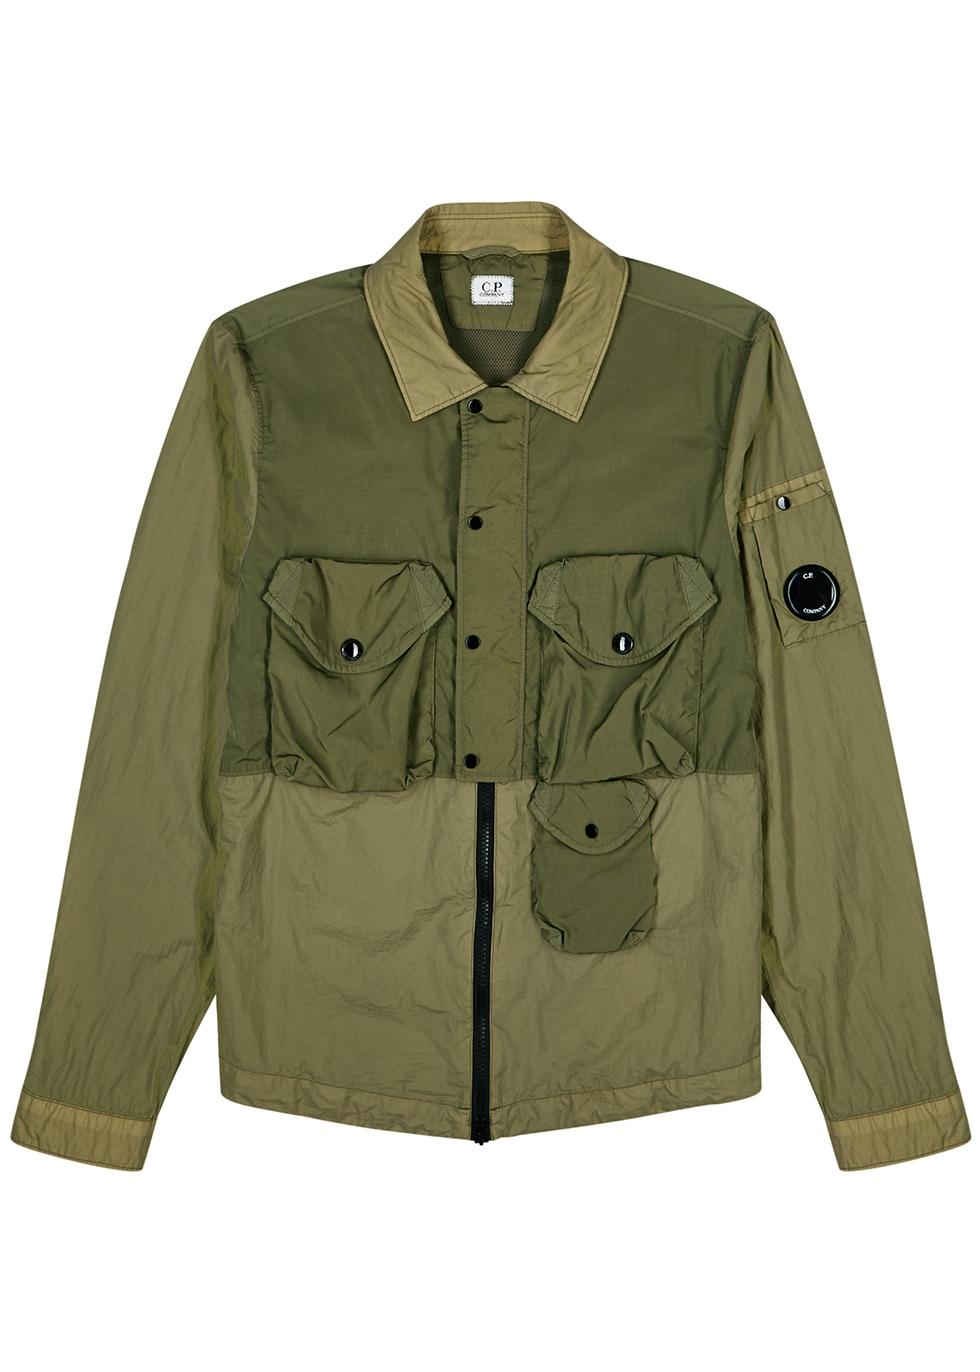 Taylon army green shell jacket